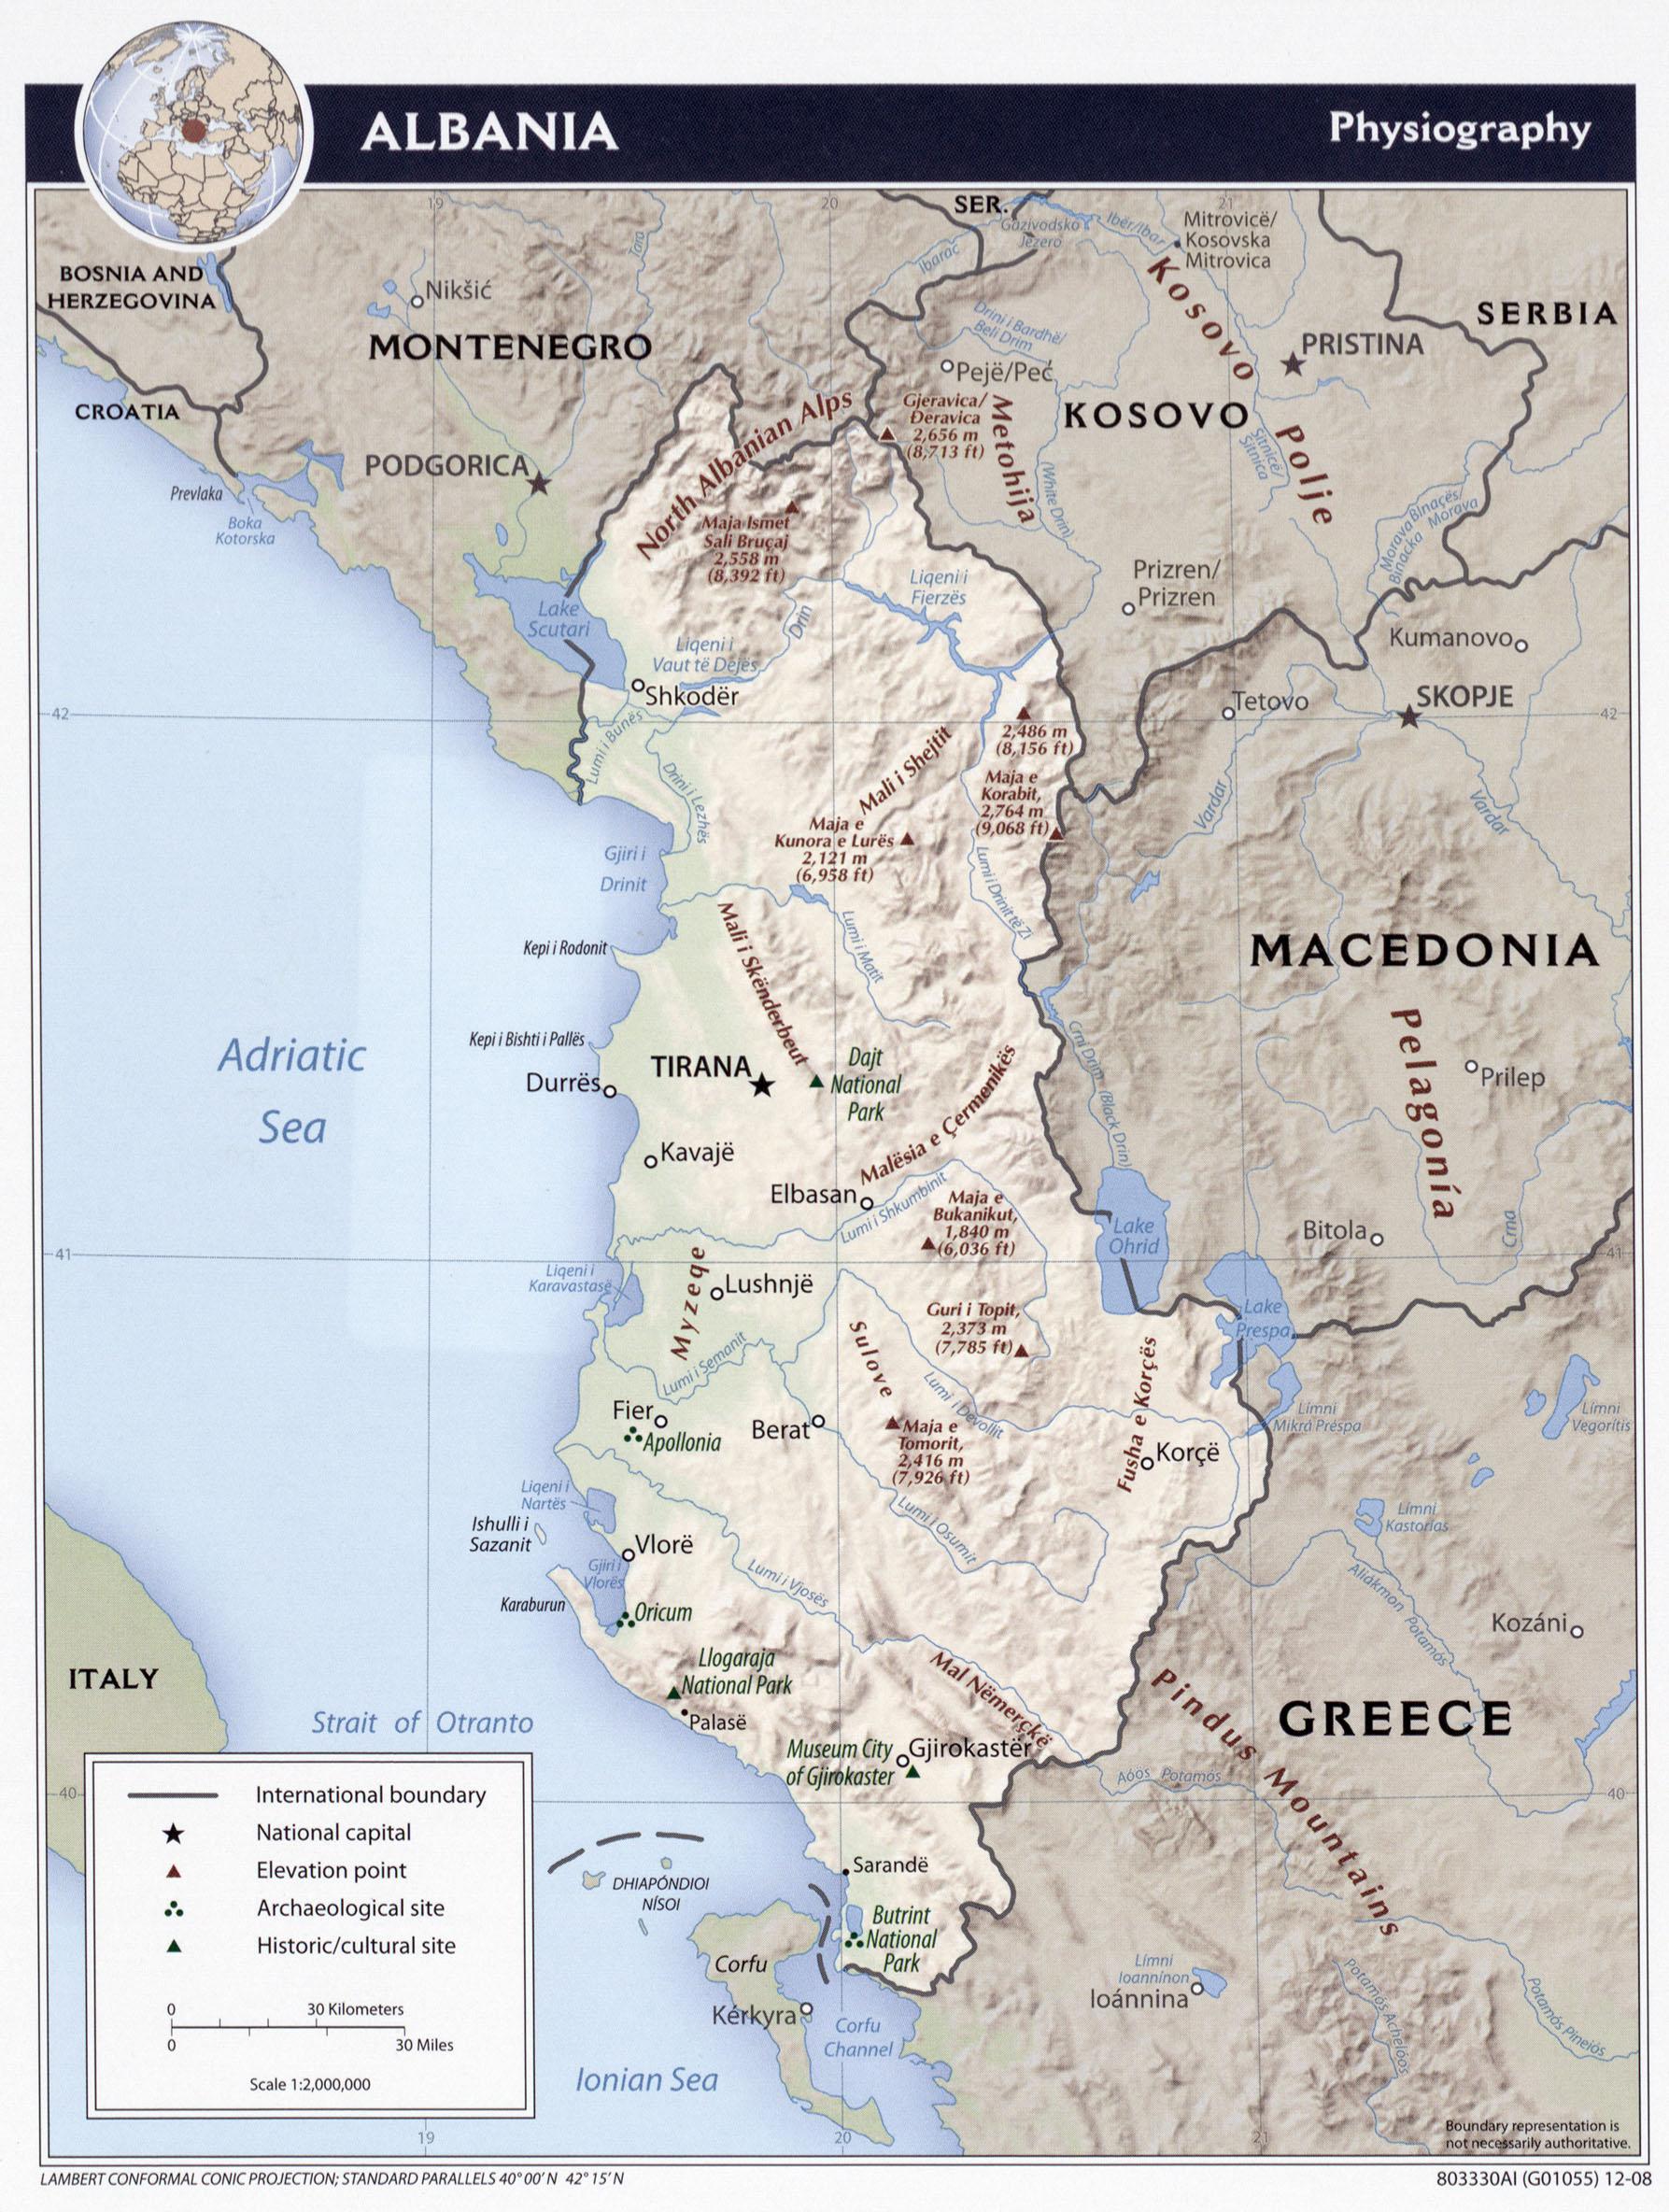 Karte Albanien.Landkarte Albanien Reliefkarte Gross Weltkarte Com Karten Und